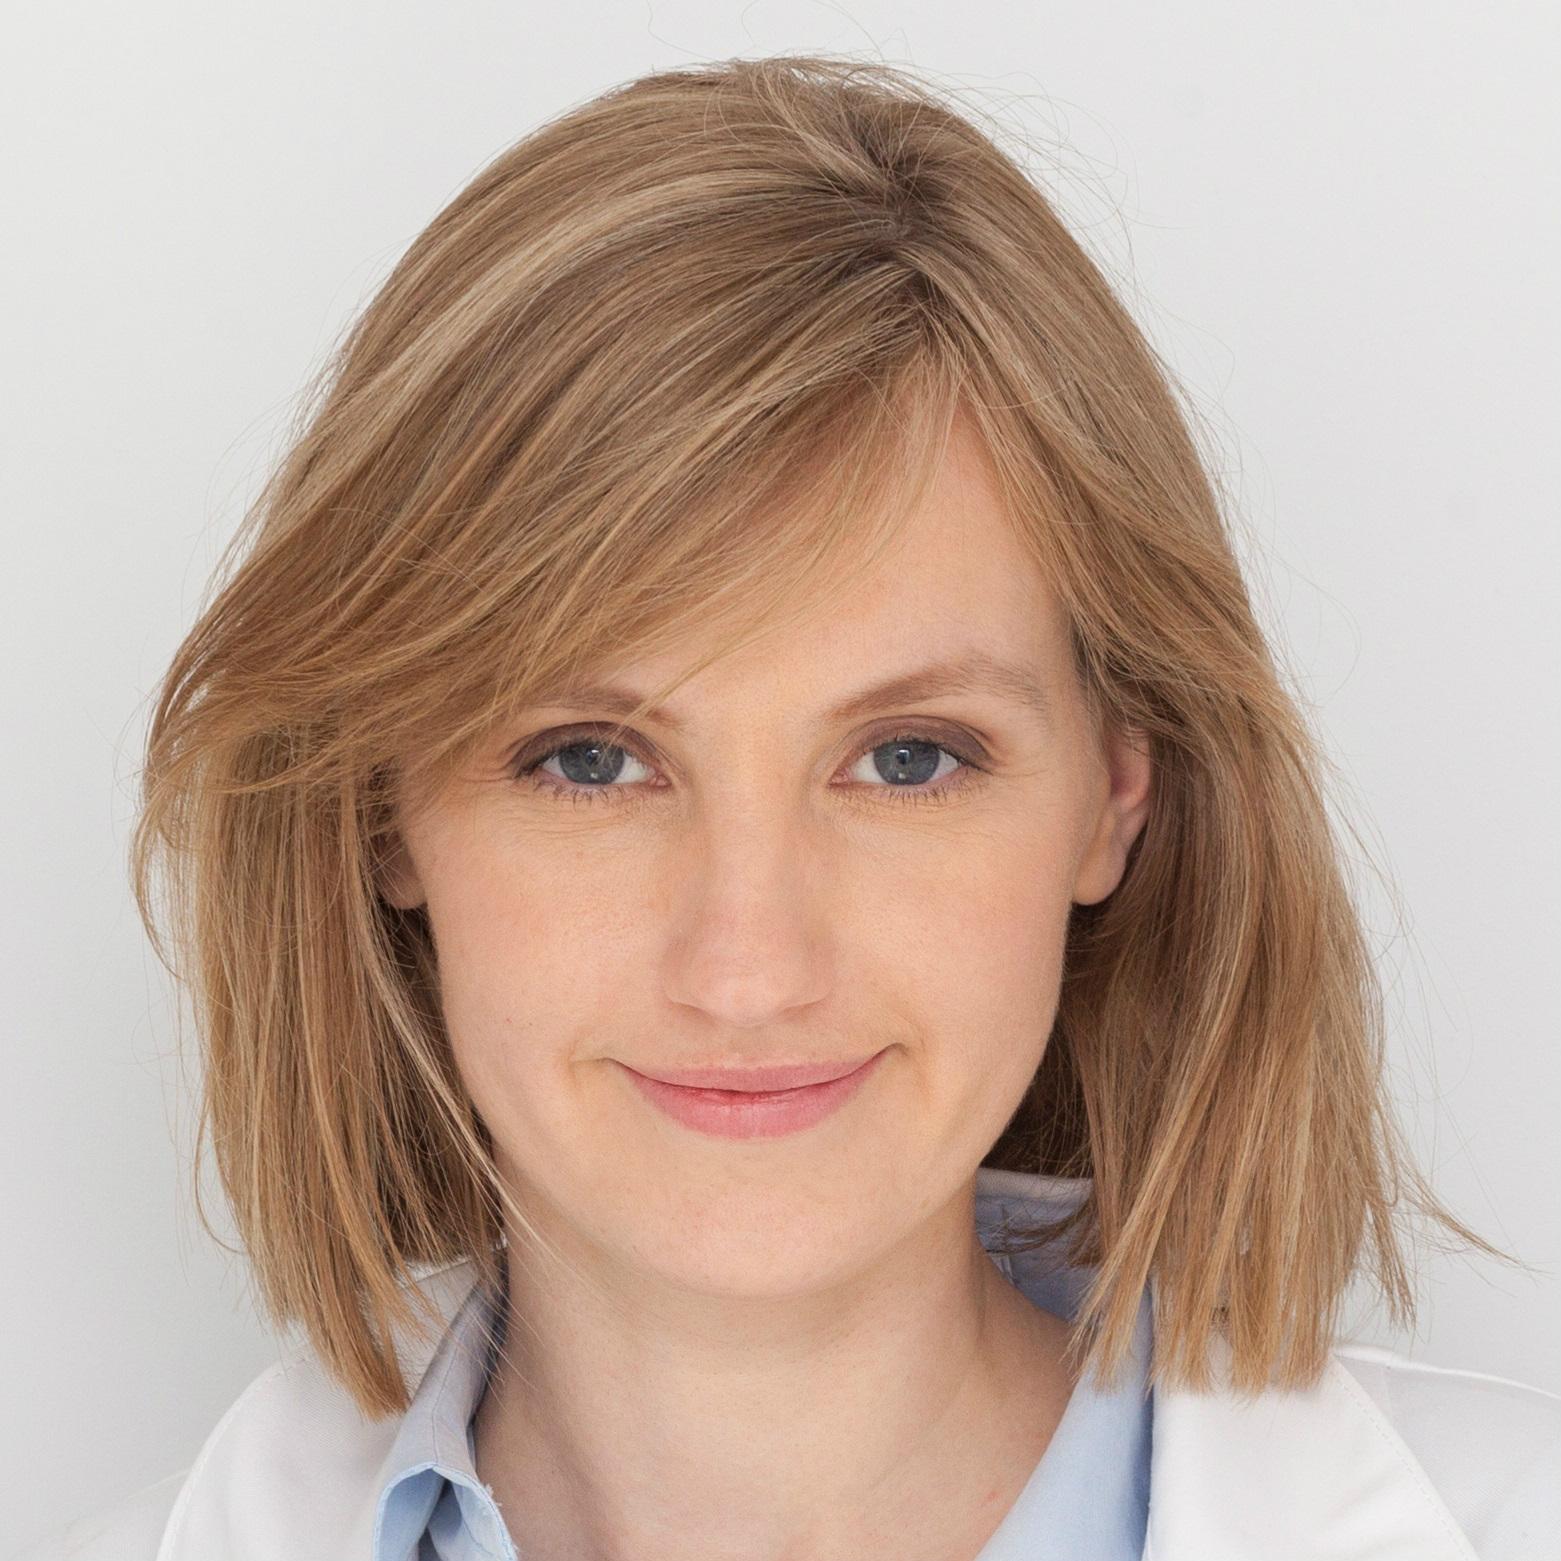 Dr Olga Malinkiewicz